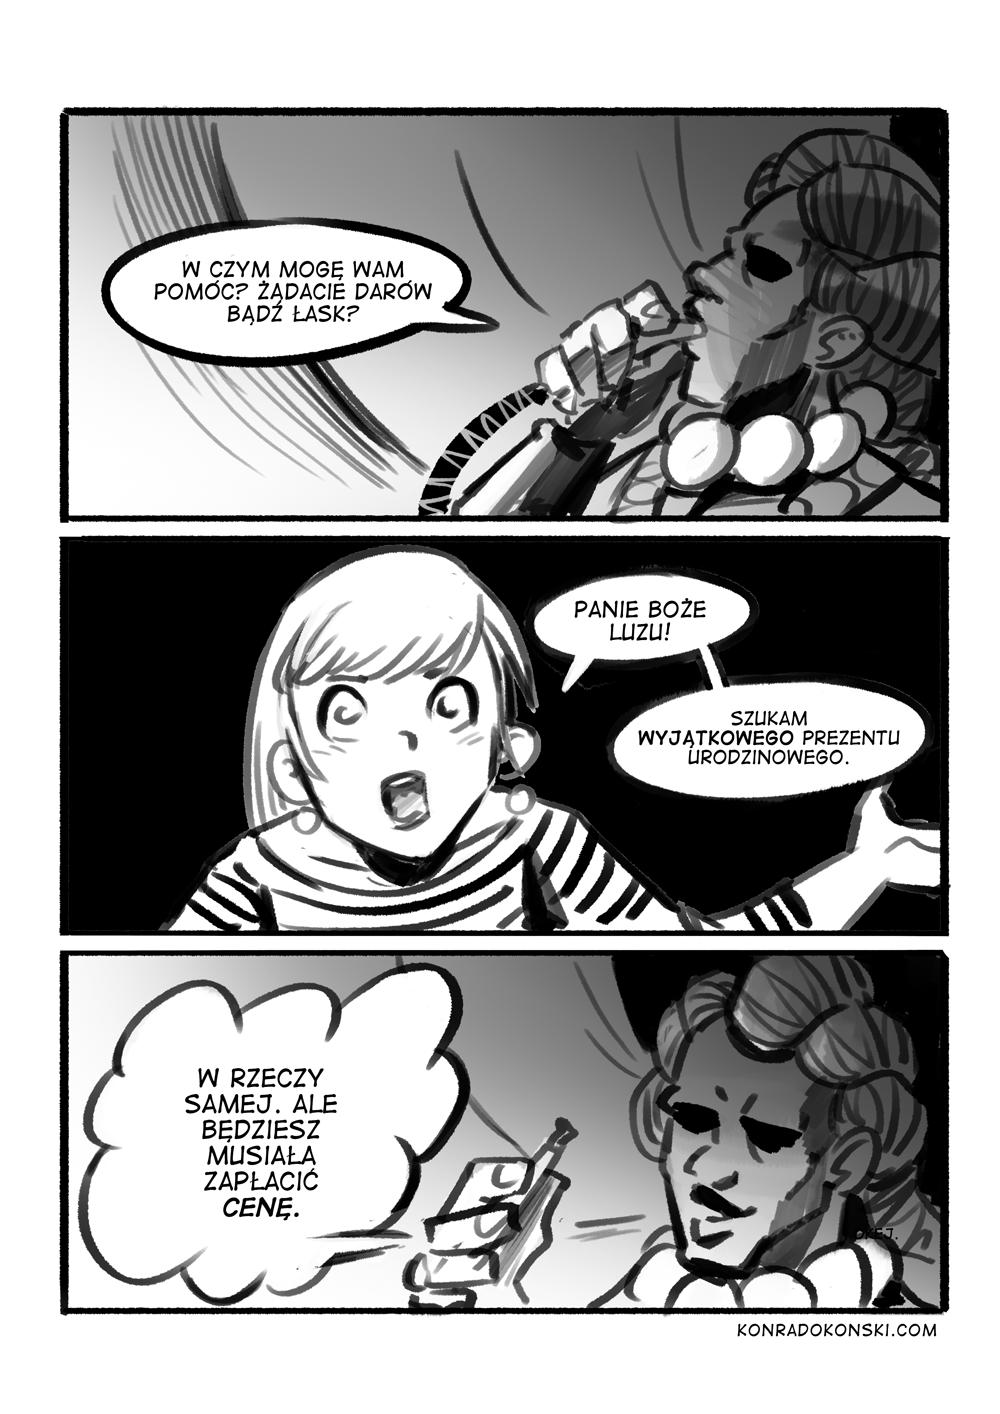 Gratka – komiks 24h – 19